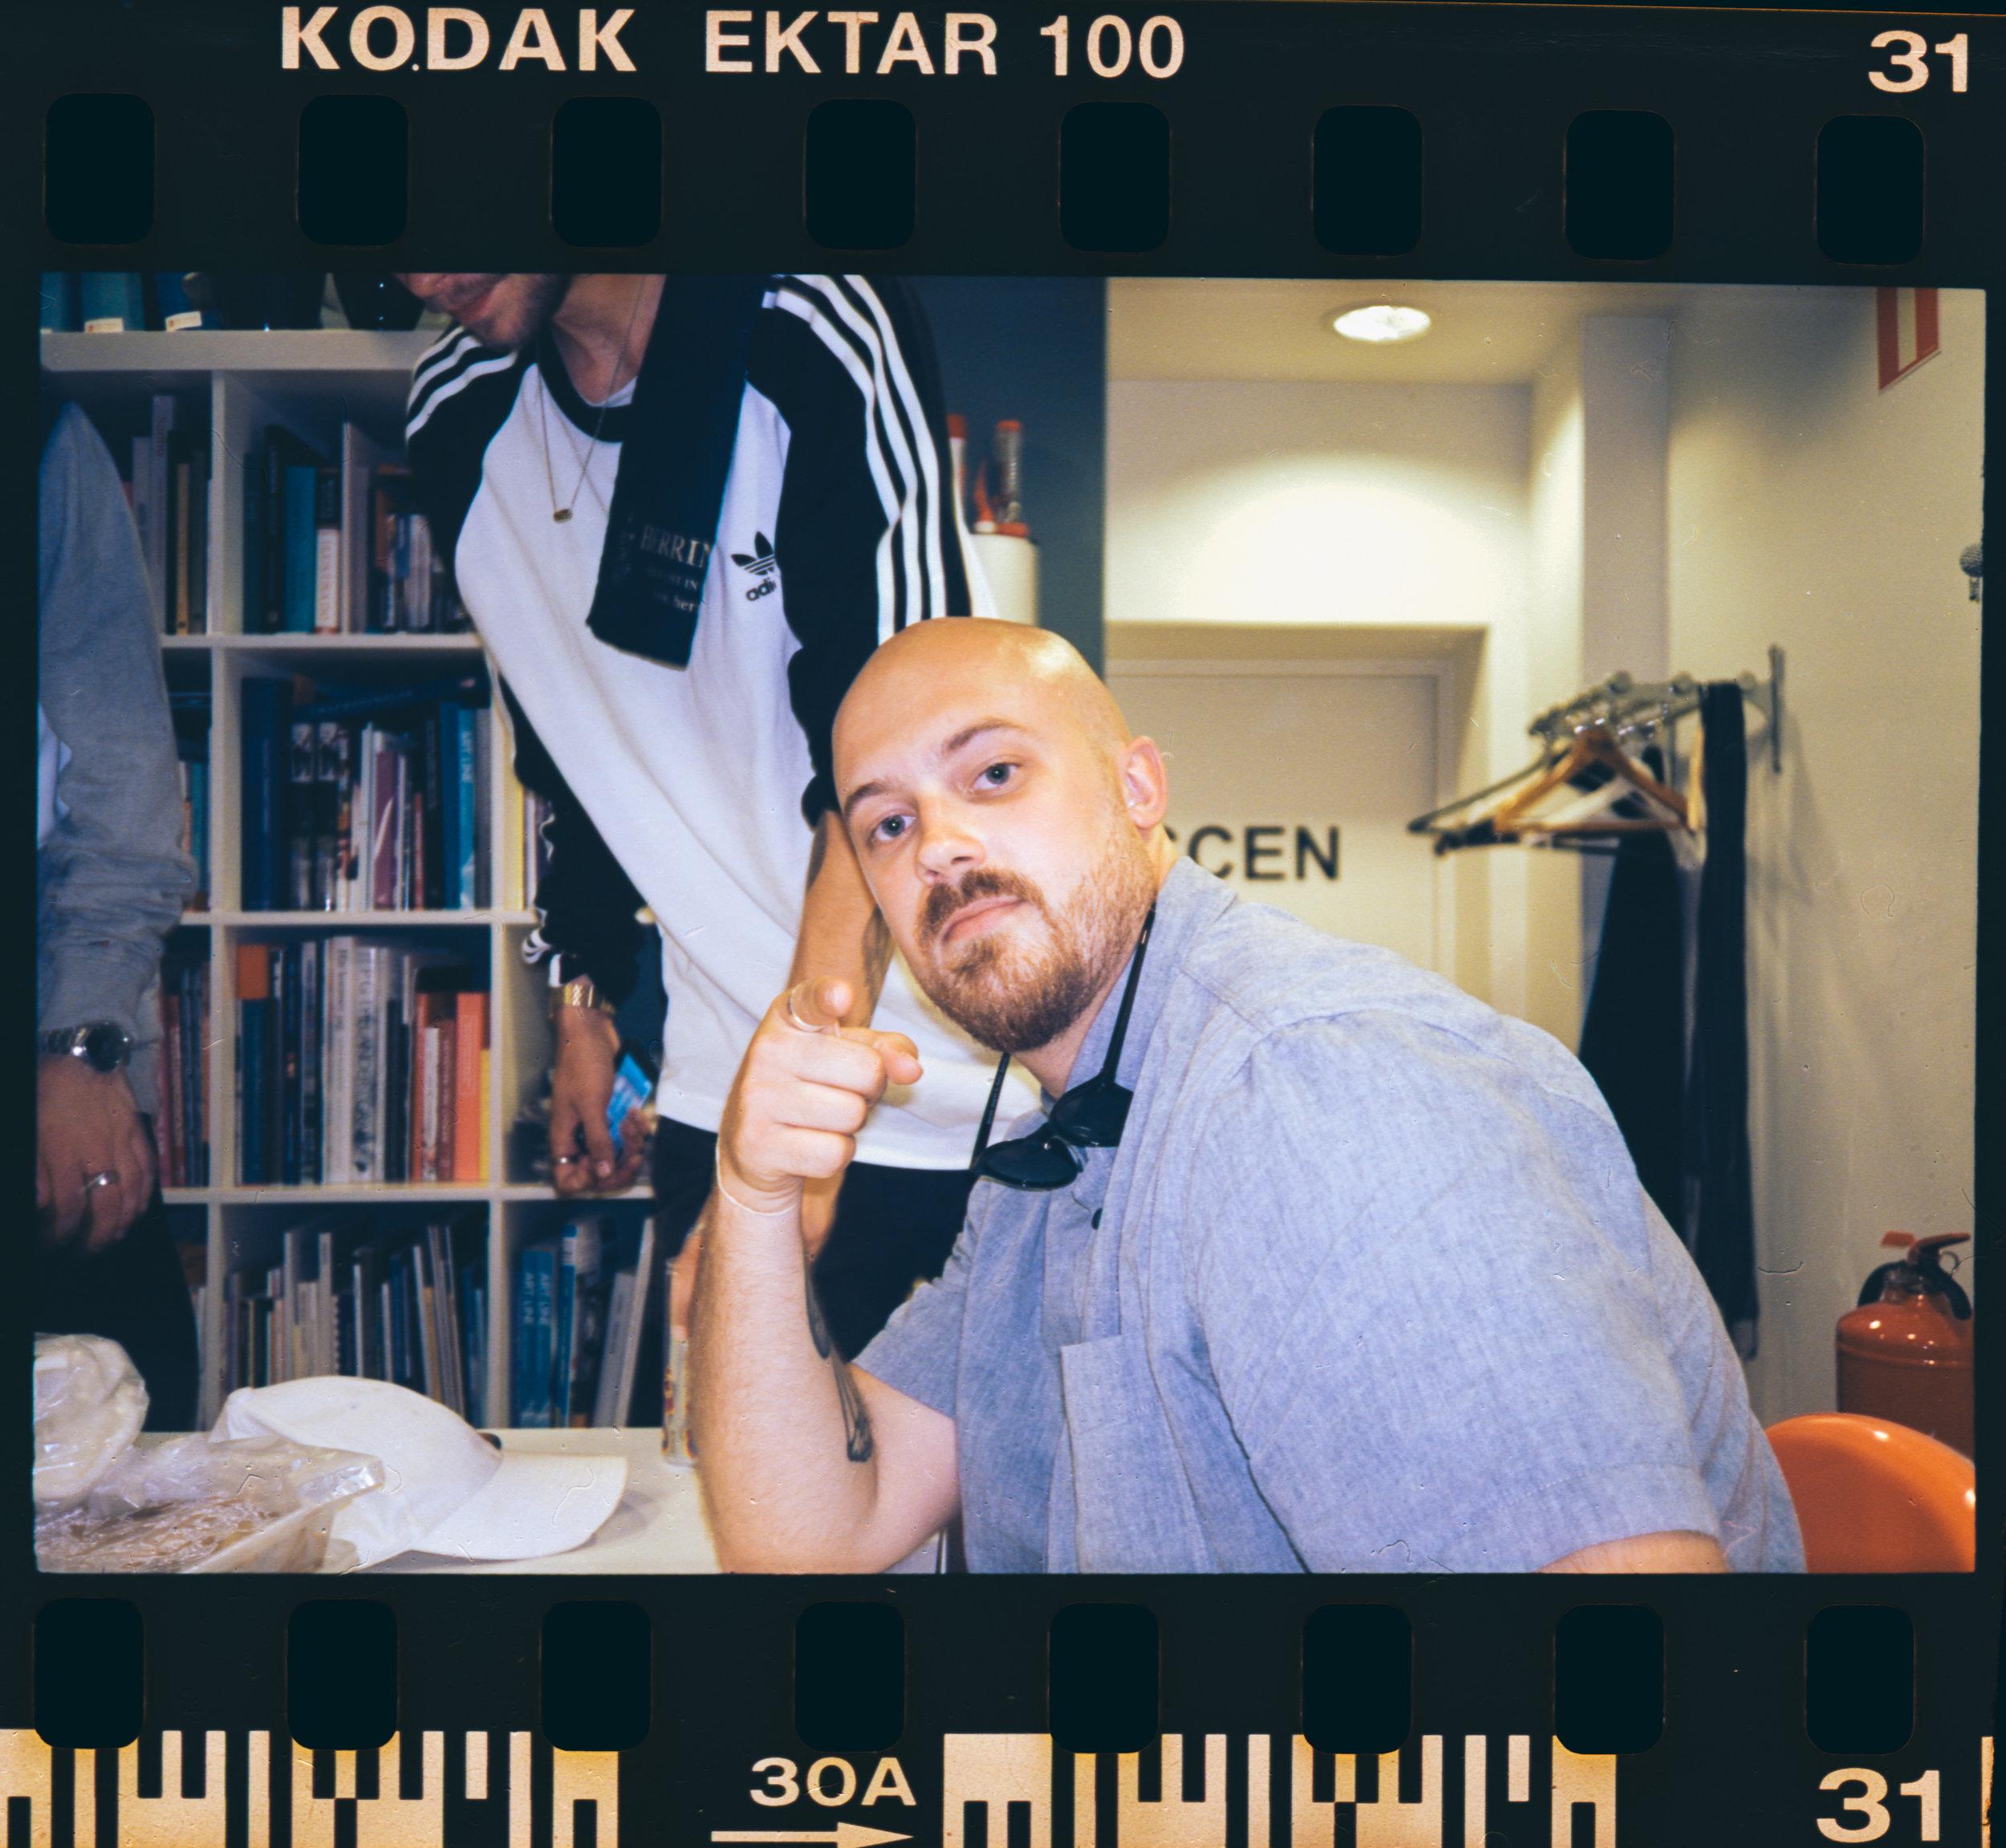 Jason 25 / Kodak Ektar 100 / Olympus Mju I